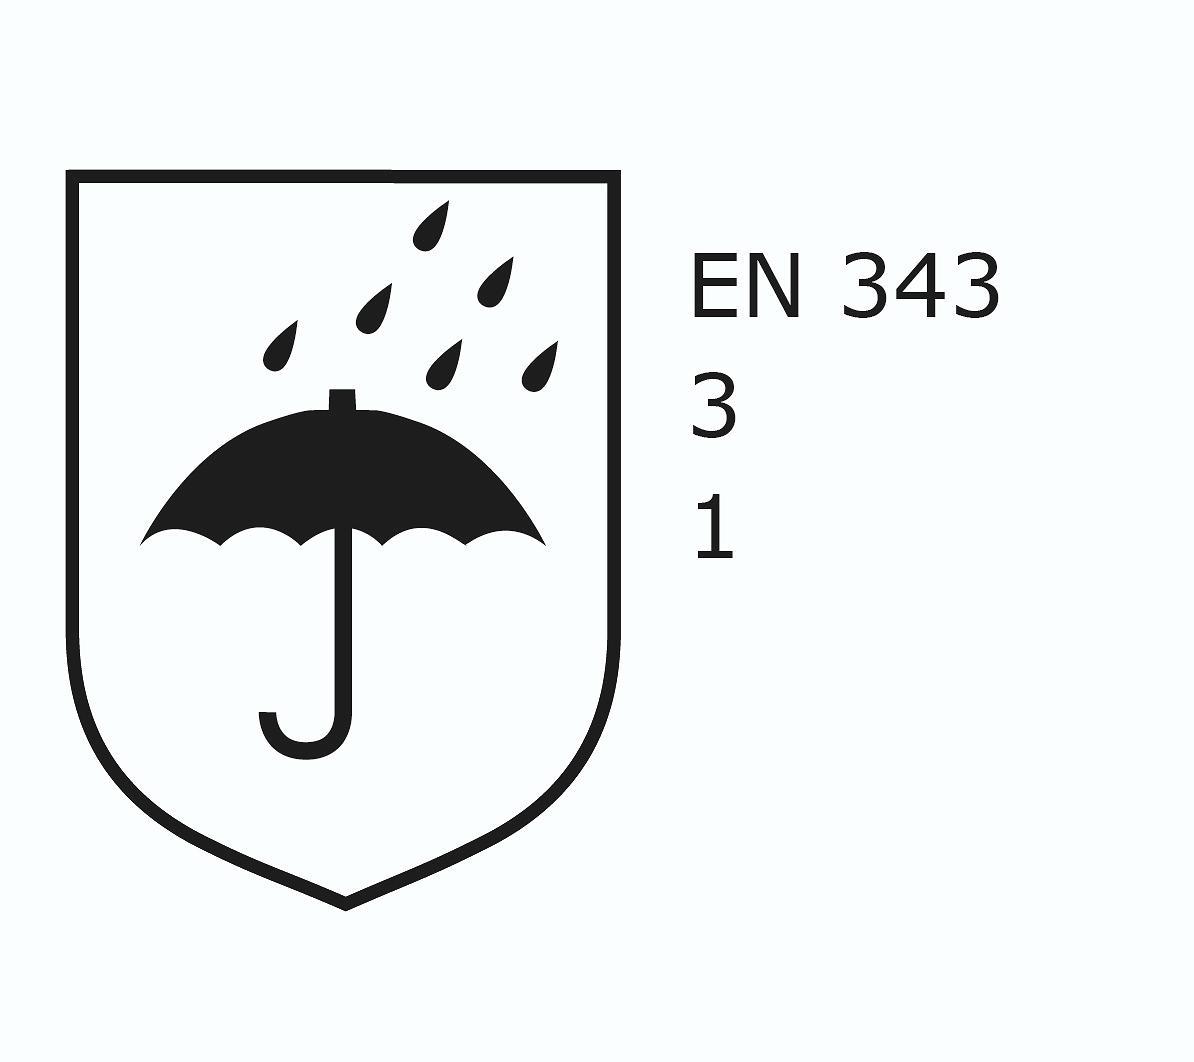 EN343 3-1